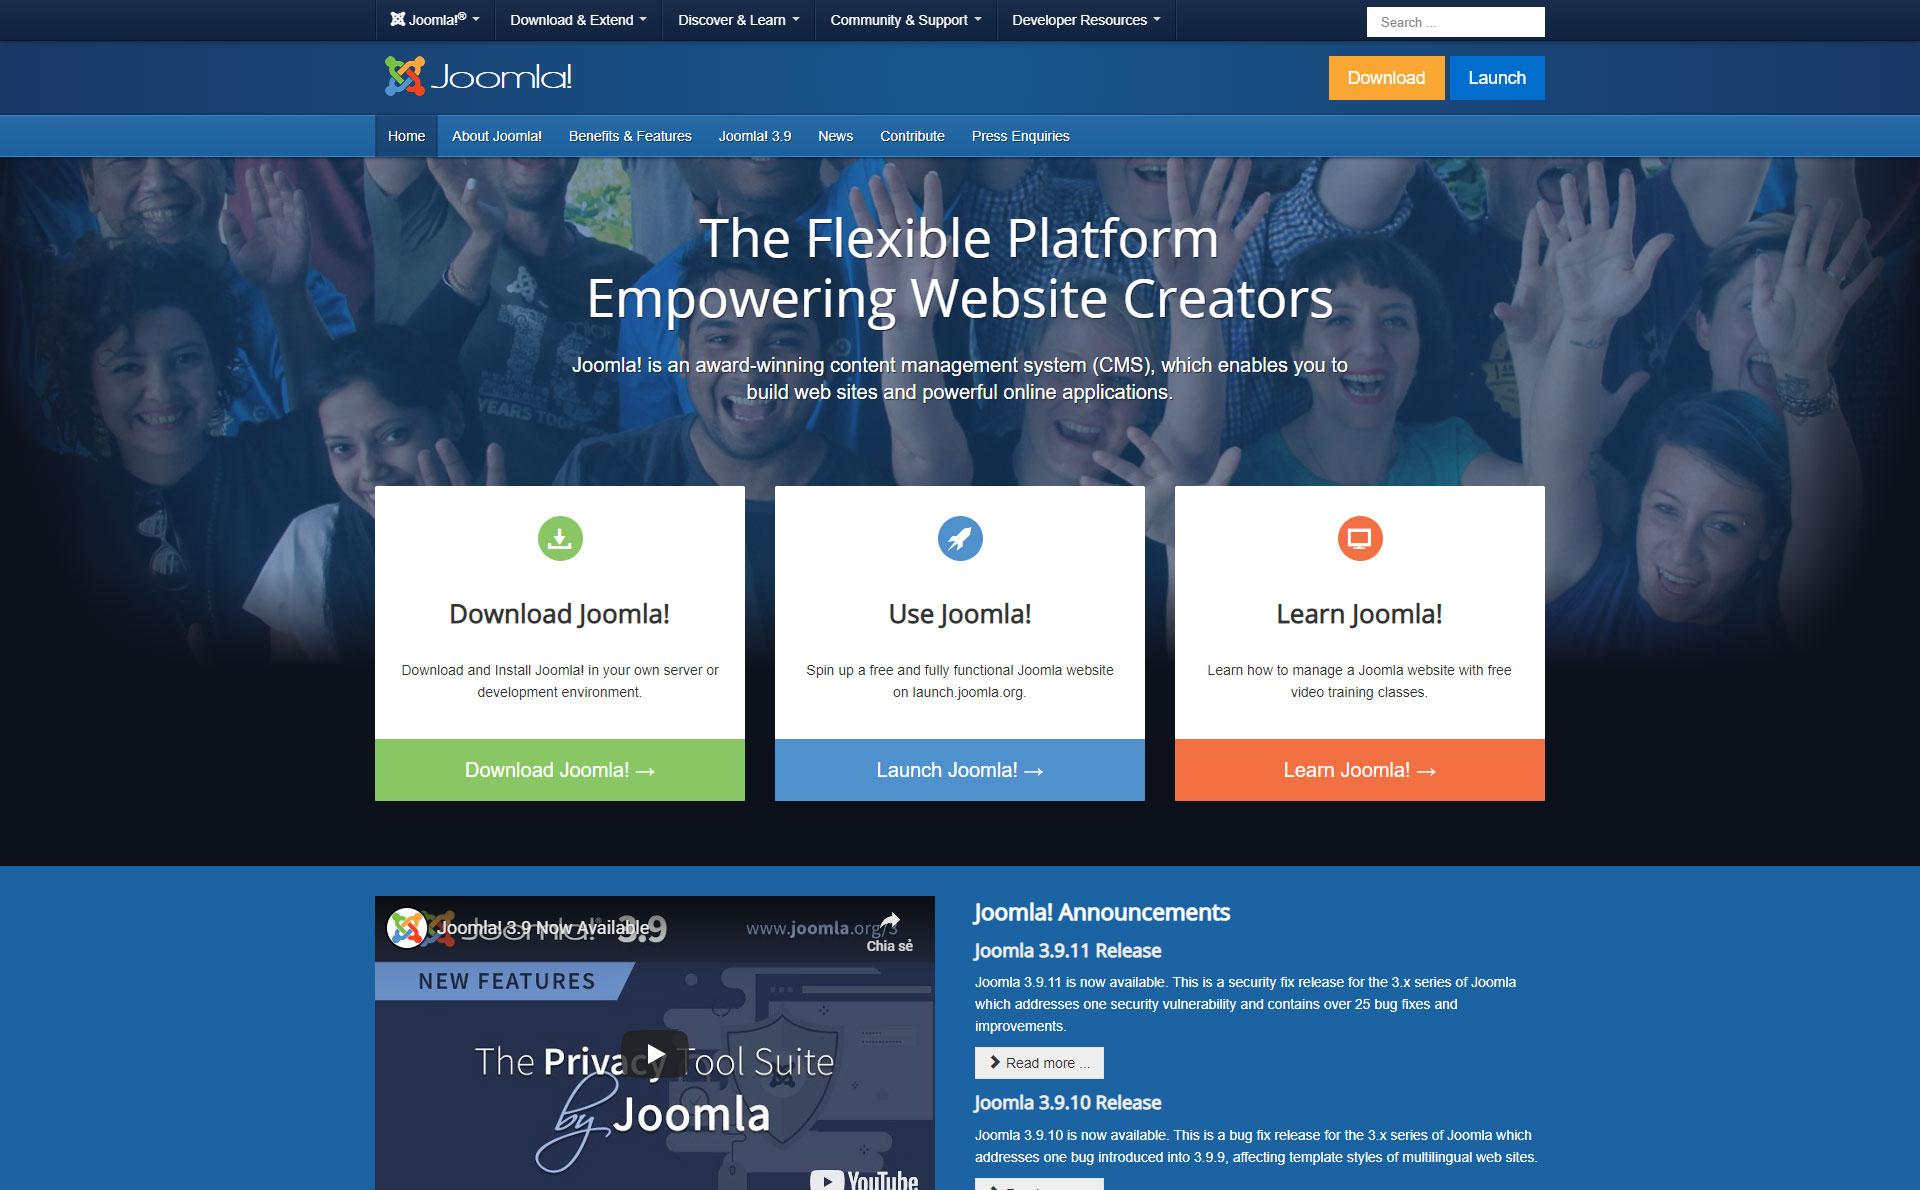 Joomla! - Best Free Content Management System